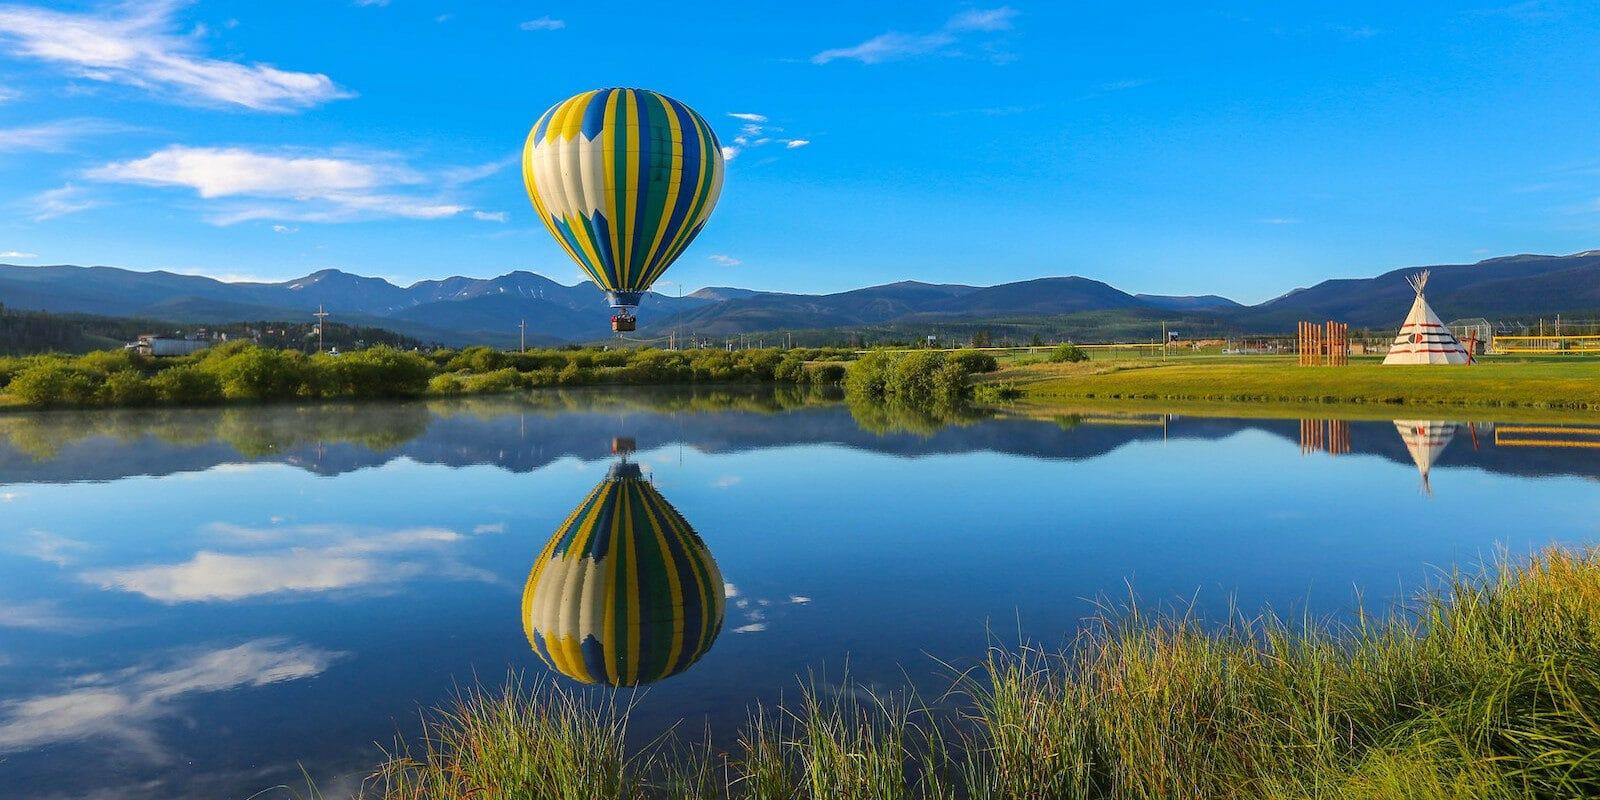 Image of a Grand Adventures Balloon Tours hot air balloon over water in Fraser, Colorado